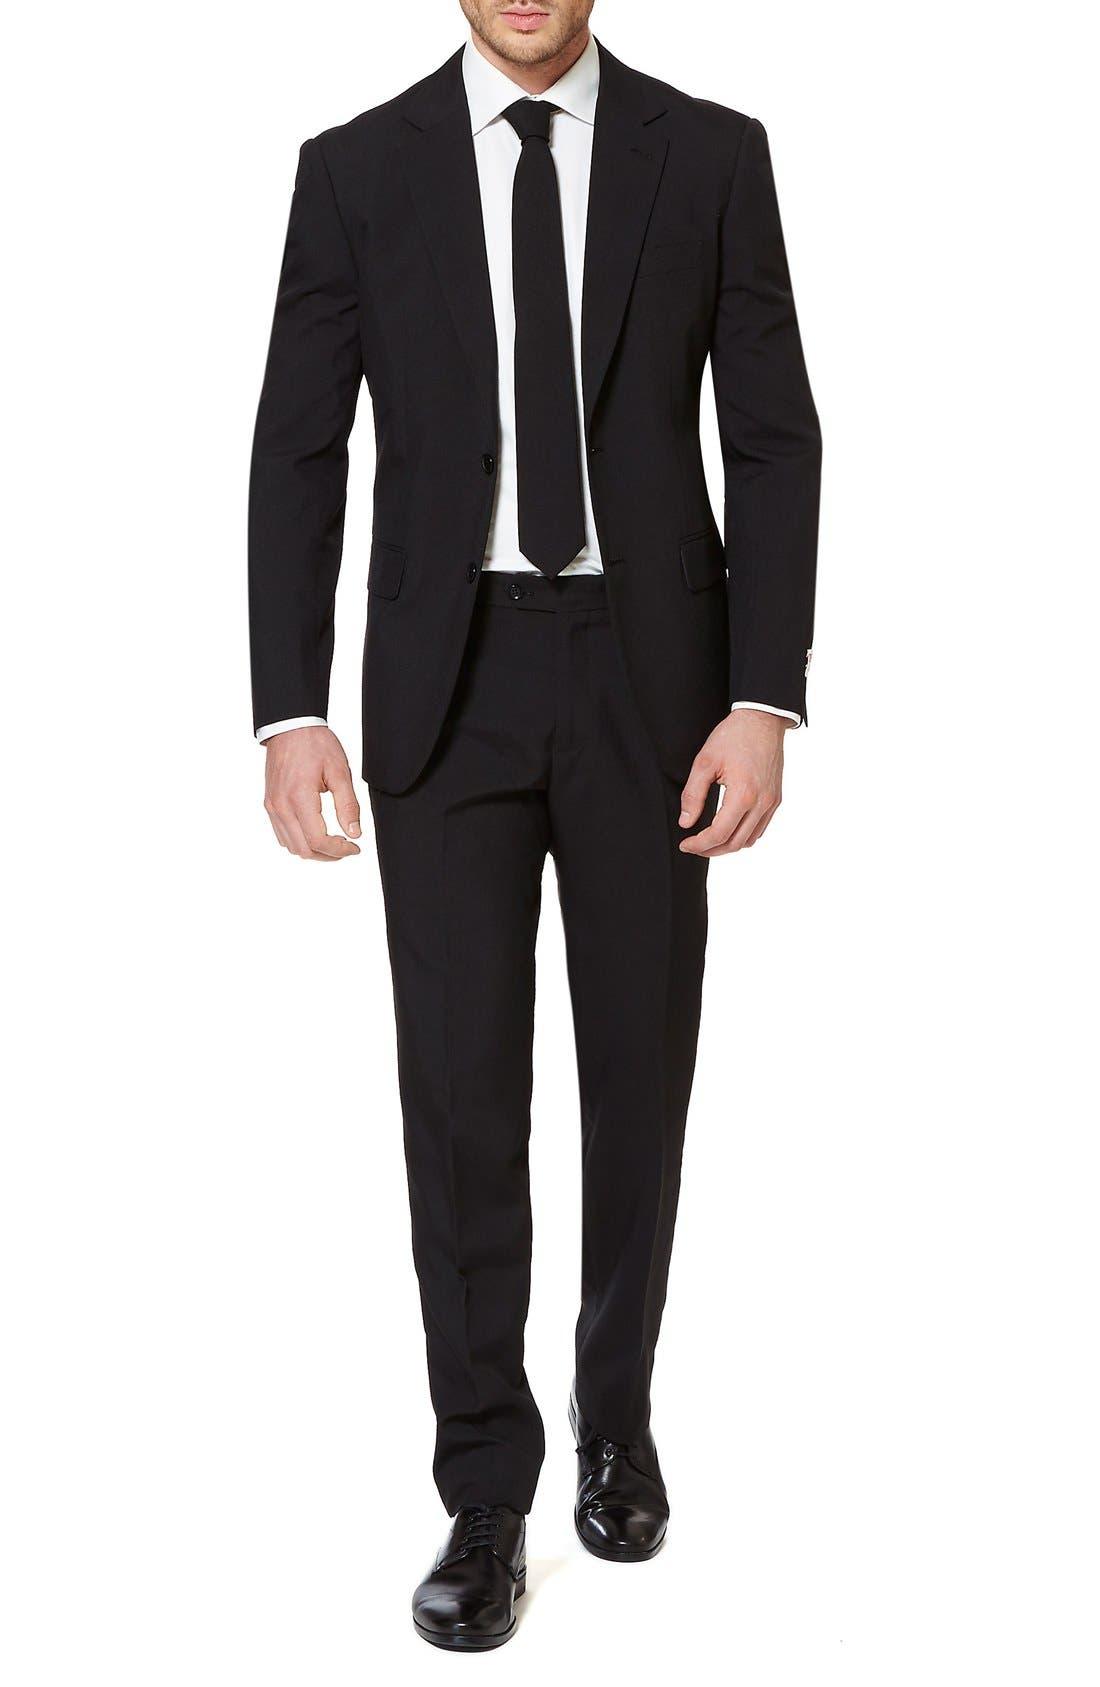 'Black Knight' Trim Fit Two-Piece Suit with Tie,                         Main,                         color, 001